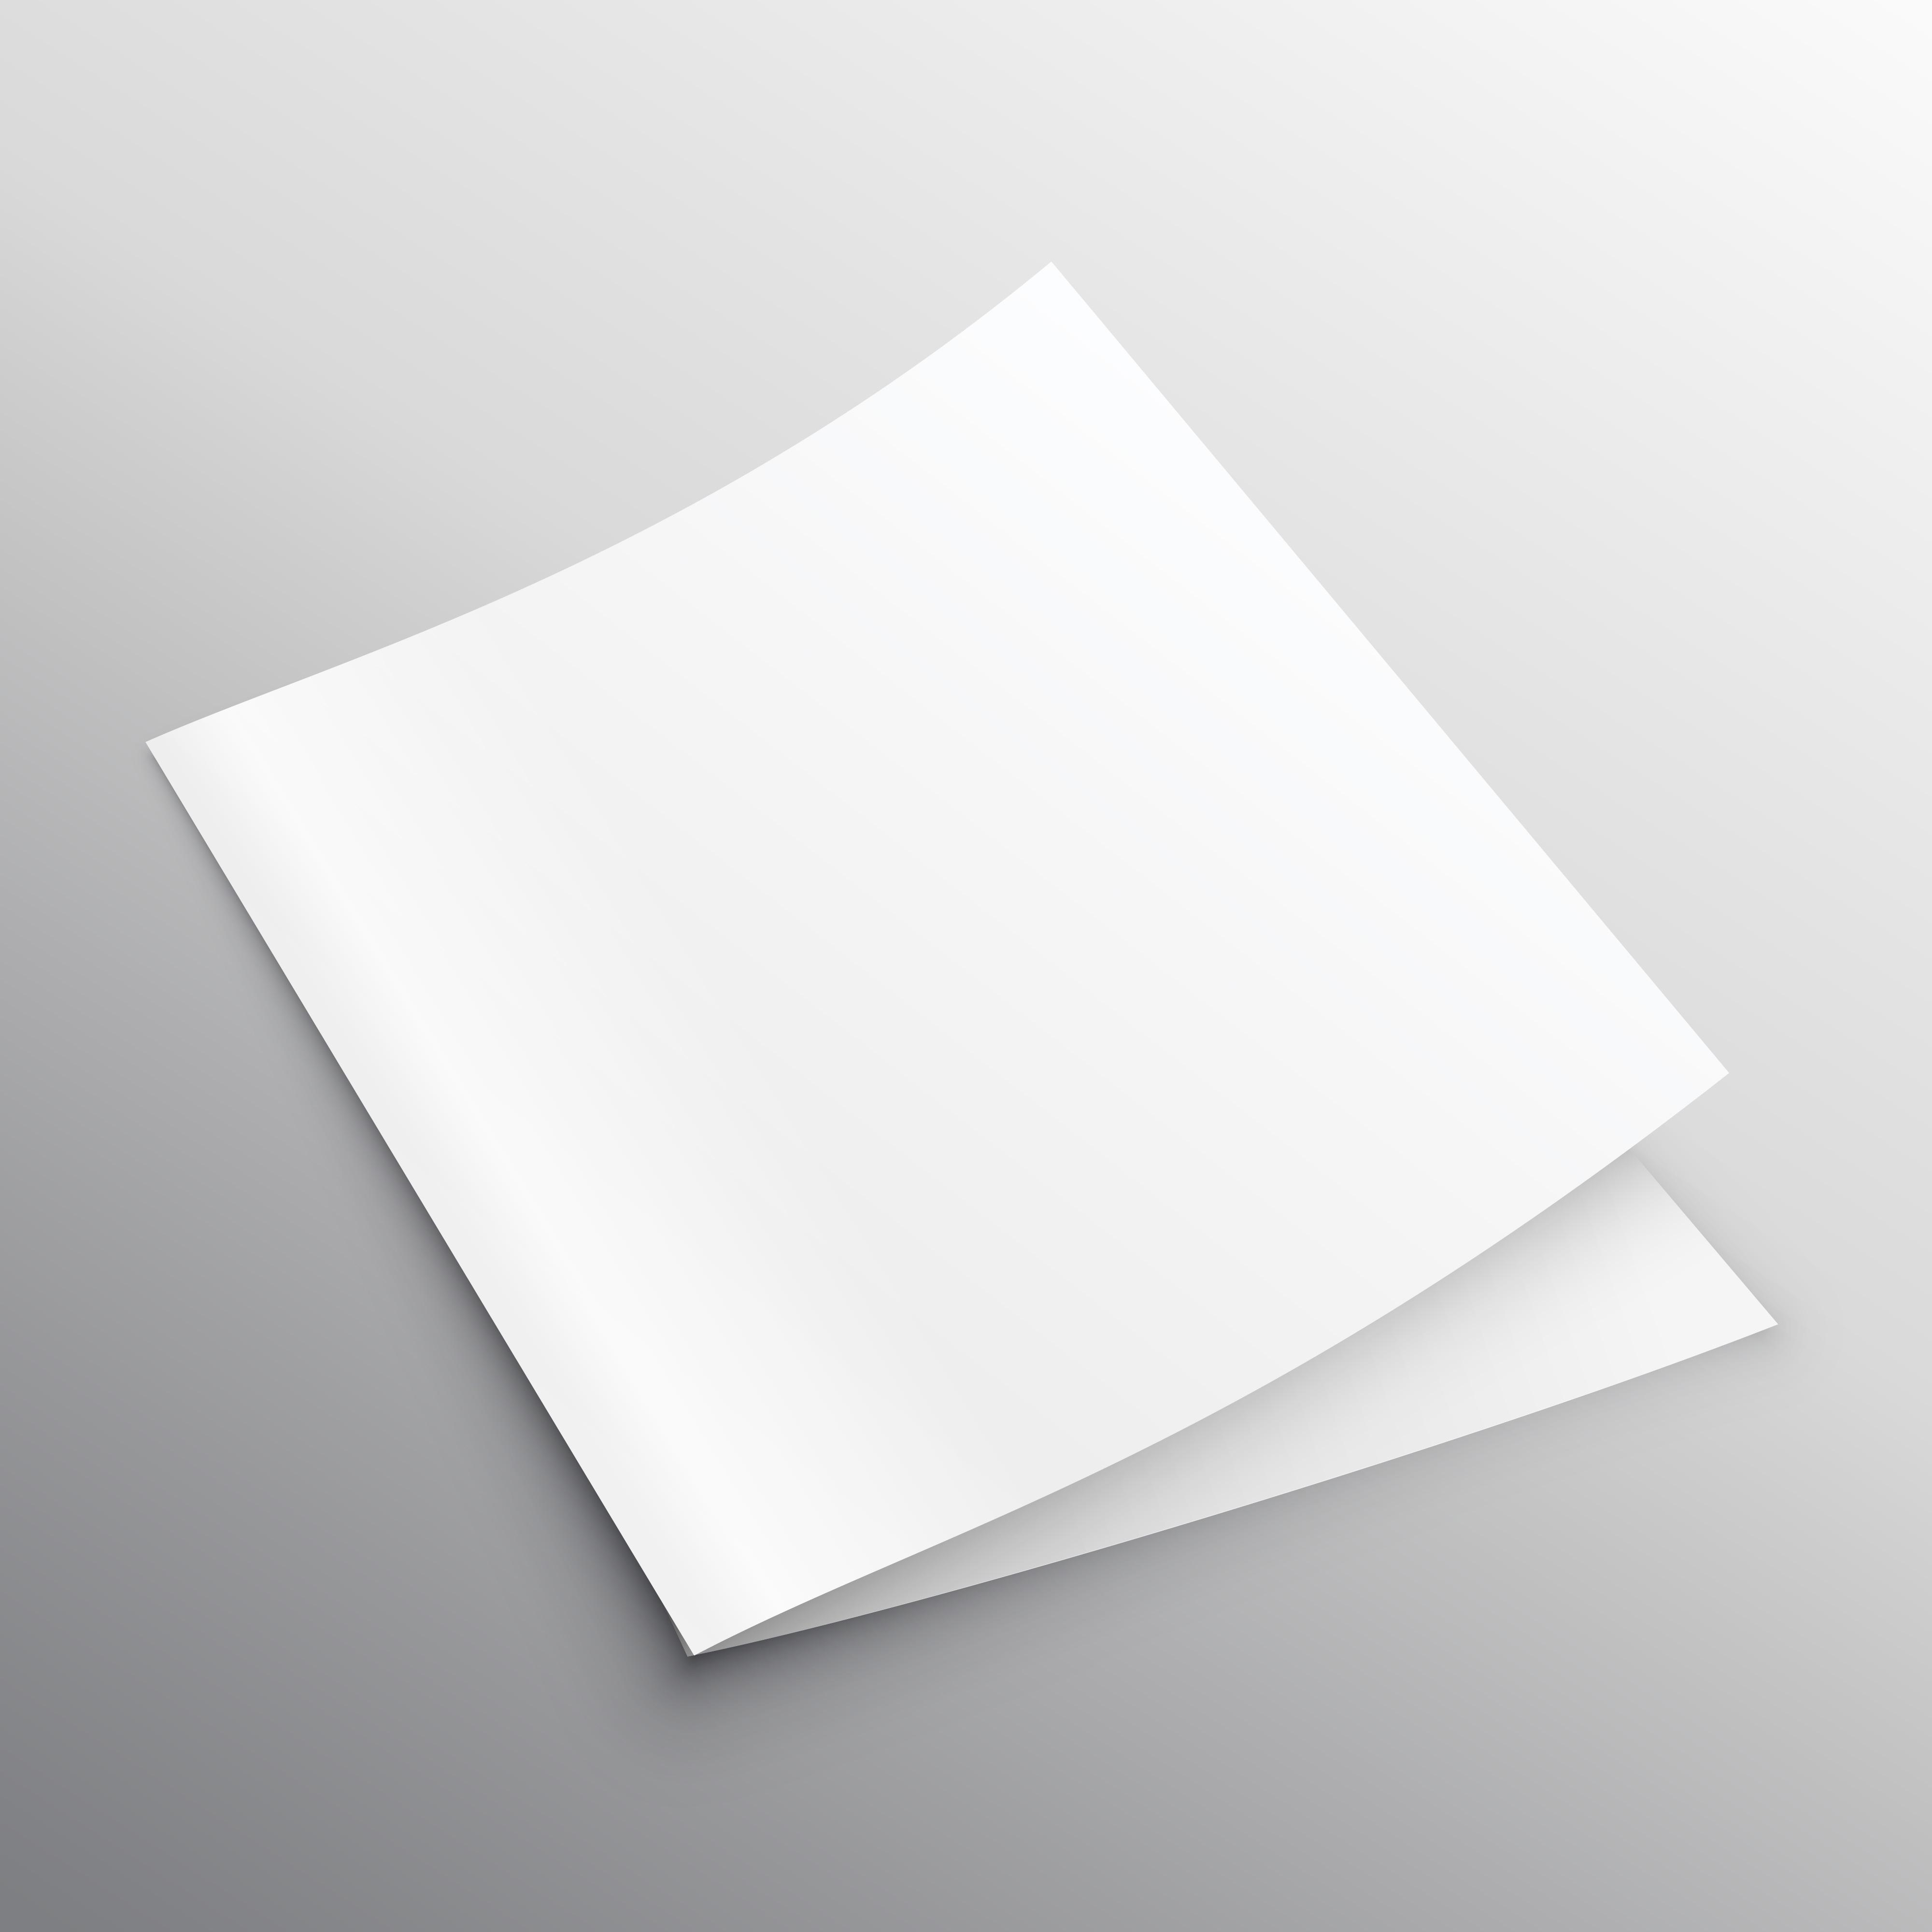 visitors book template free download - blank mockup bi fold or book template vector design